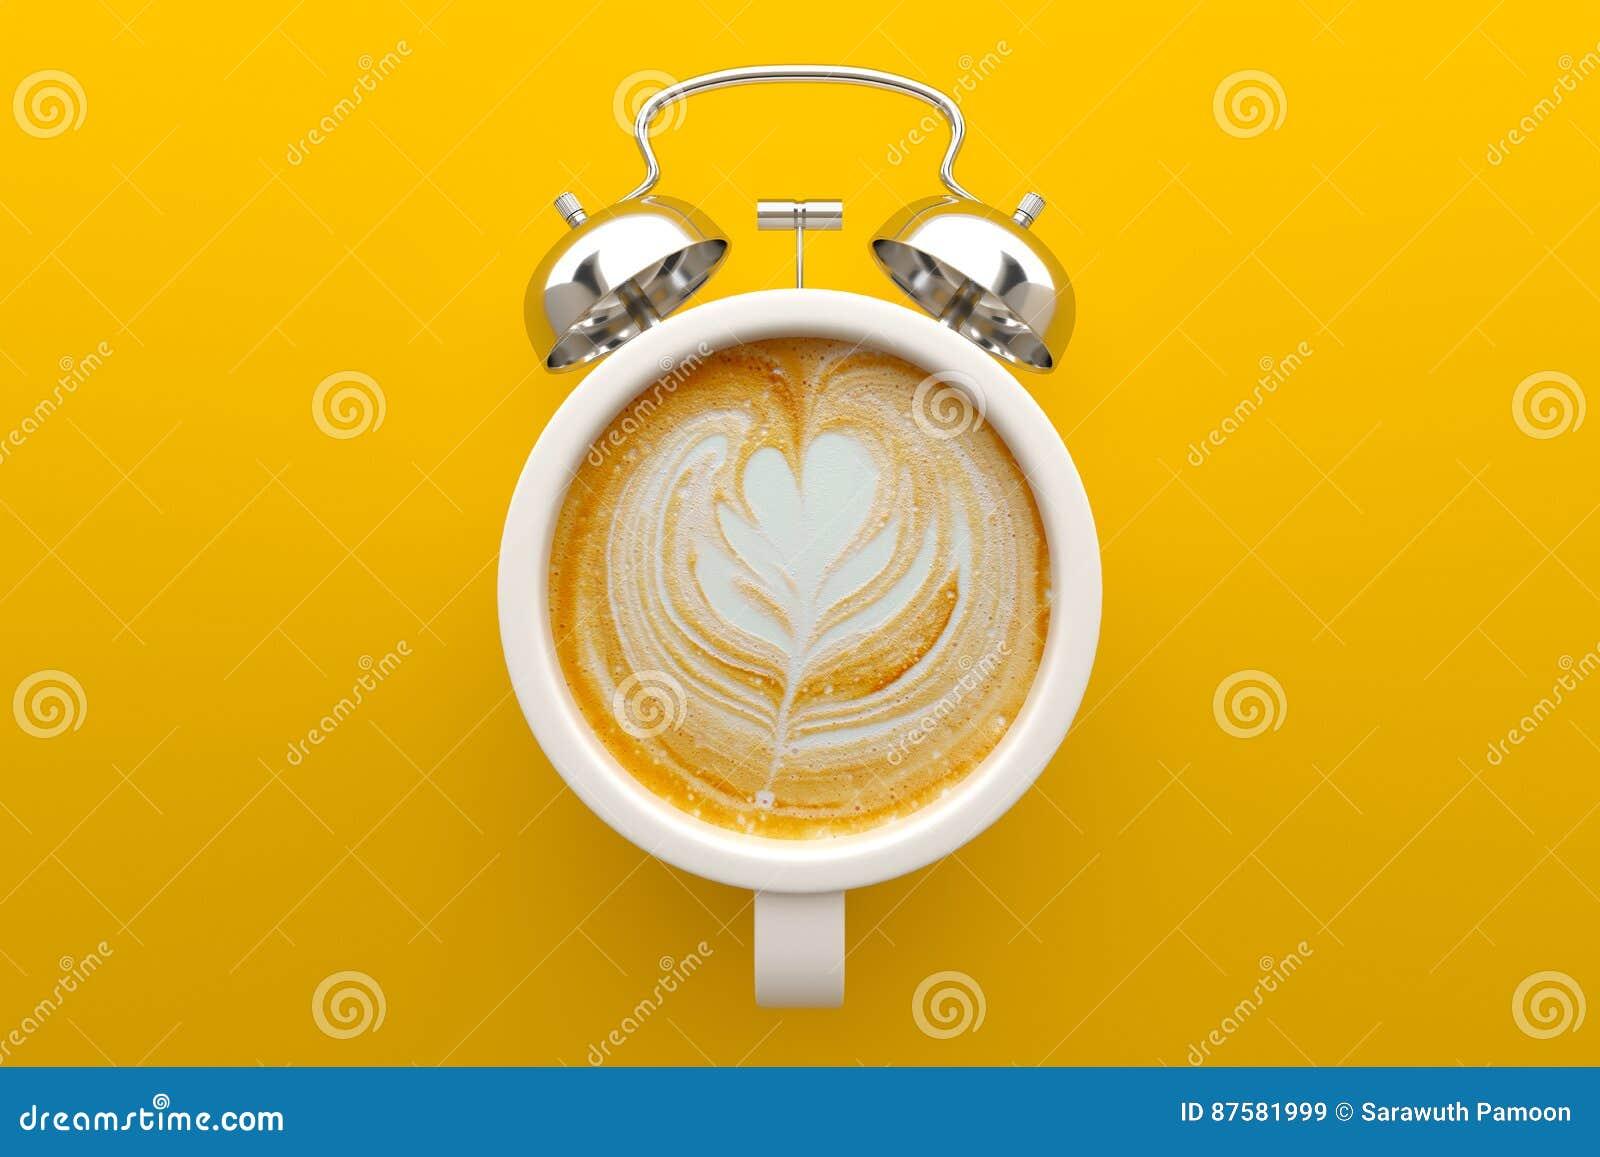 Coffee time concept, Latte art.